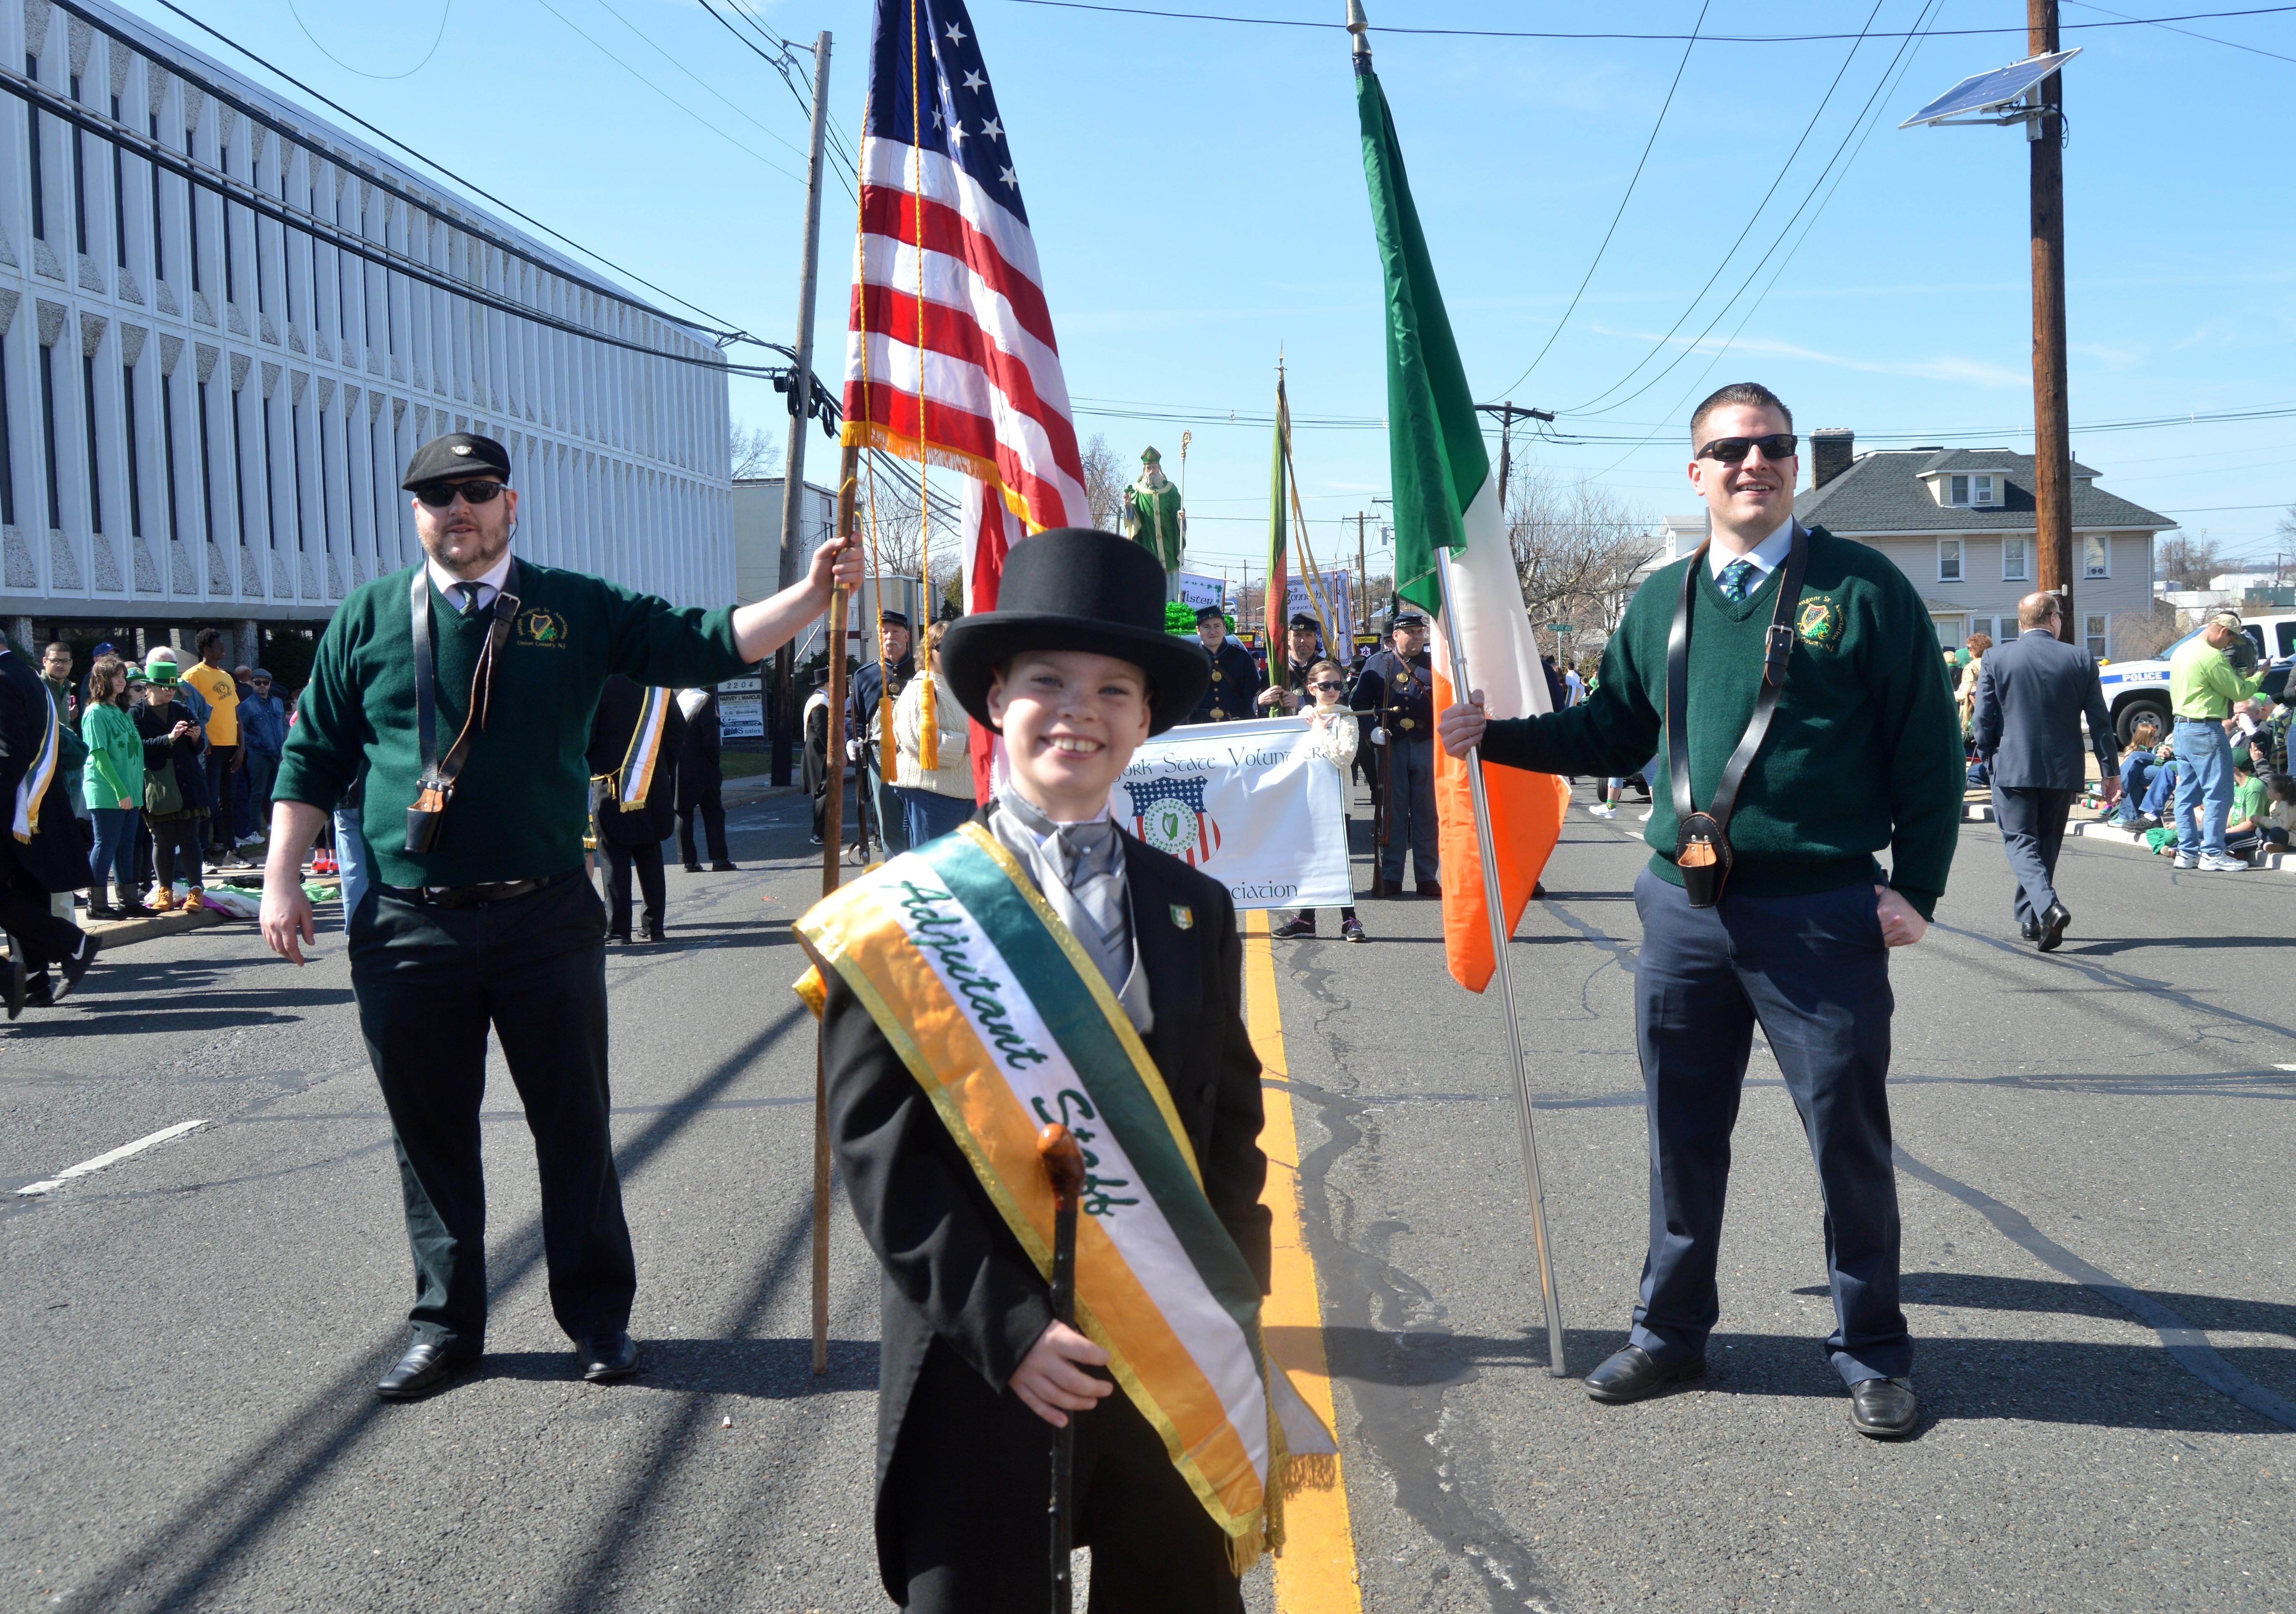 3aa555b5eb141e0367ad_St._Patrick_s_Day_2016_-_parade_start.JPG